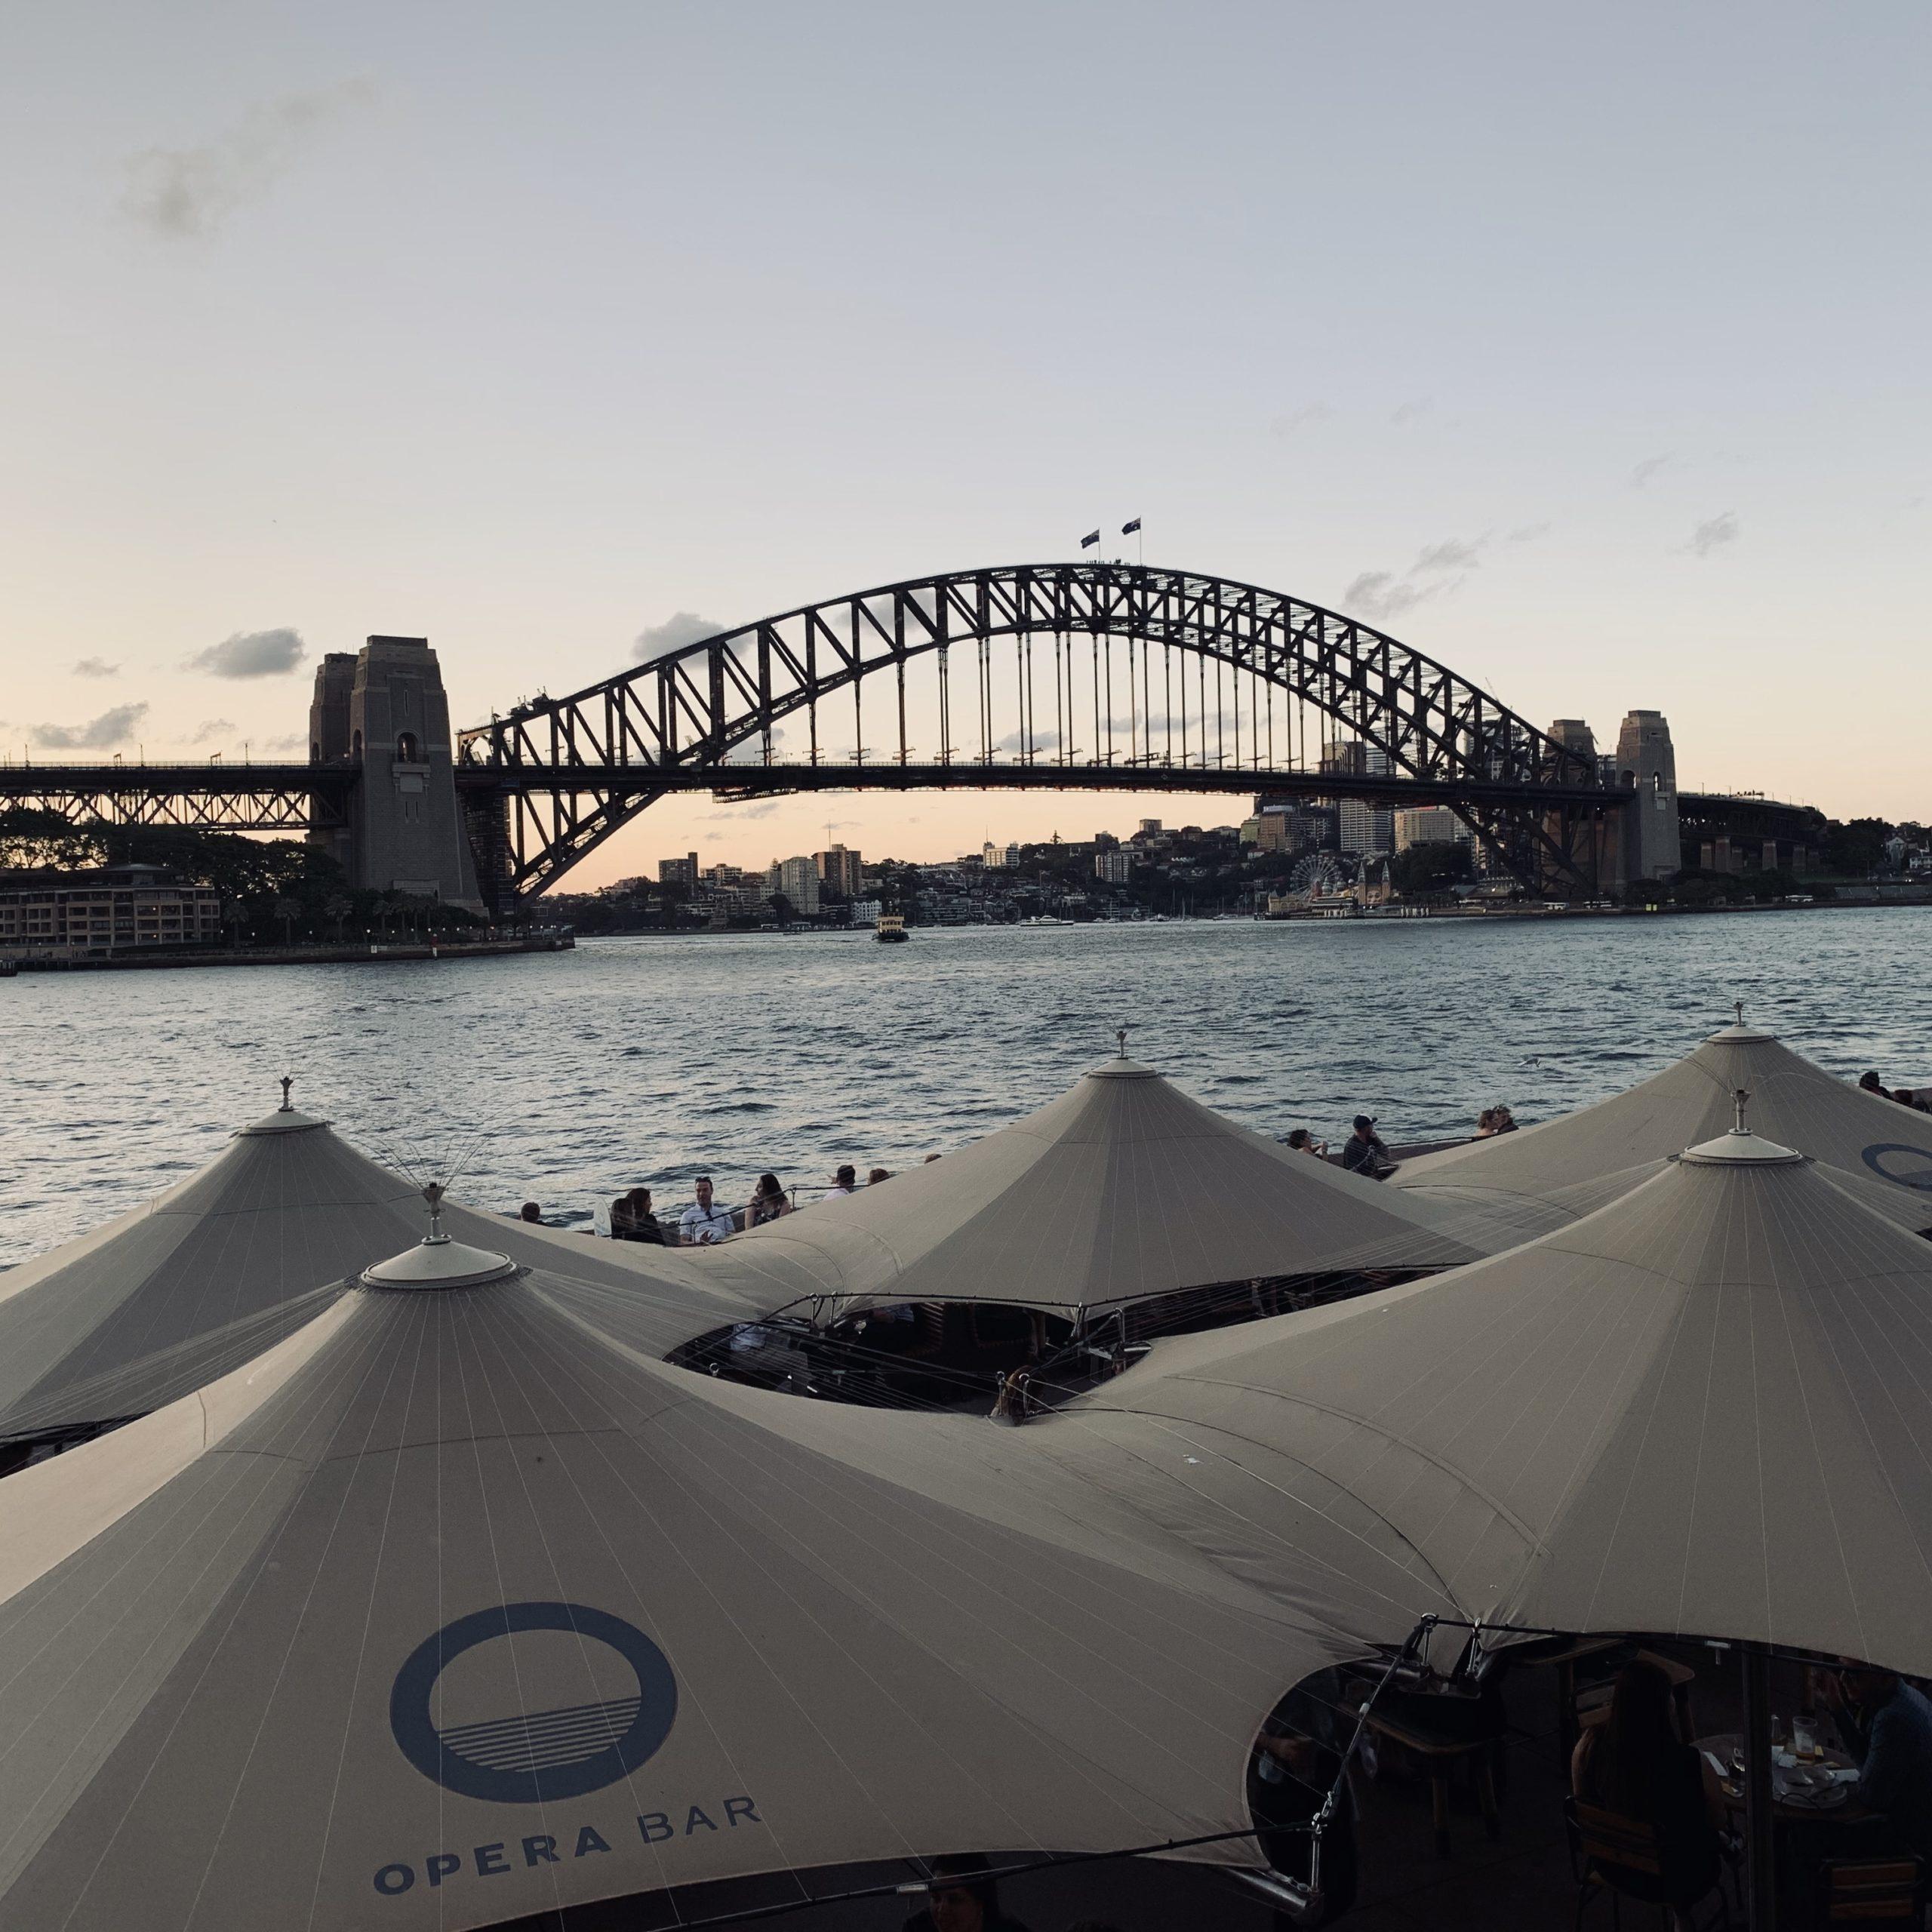 Sydney シドニー サーキュラーキー 世界遺産 オペラハウス operahouse